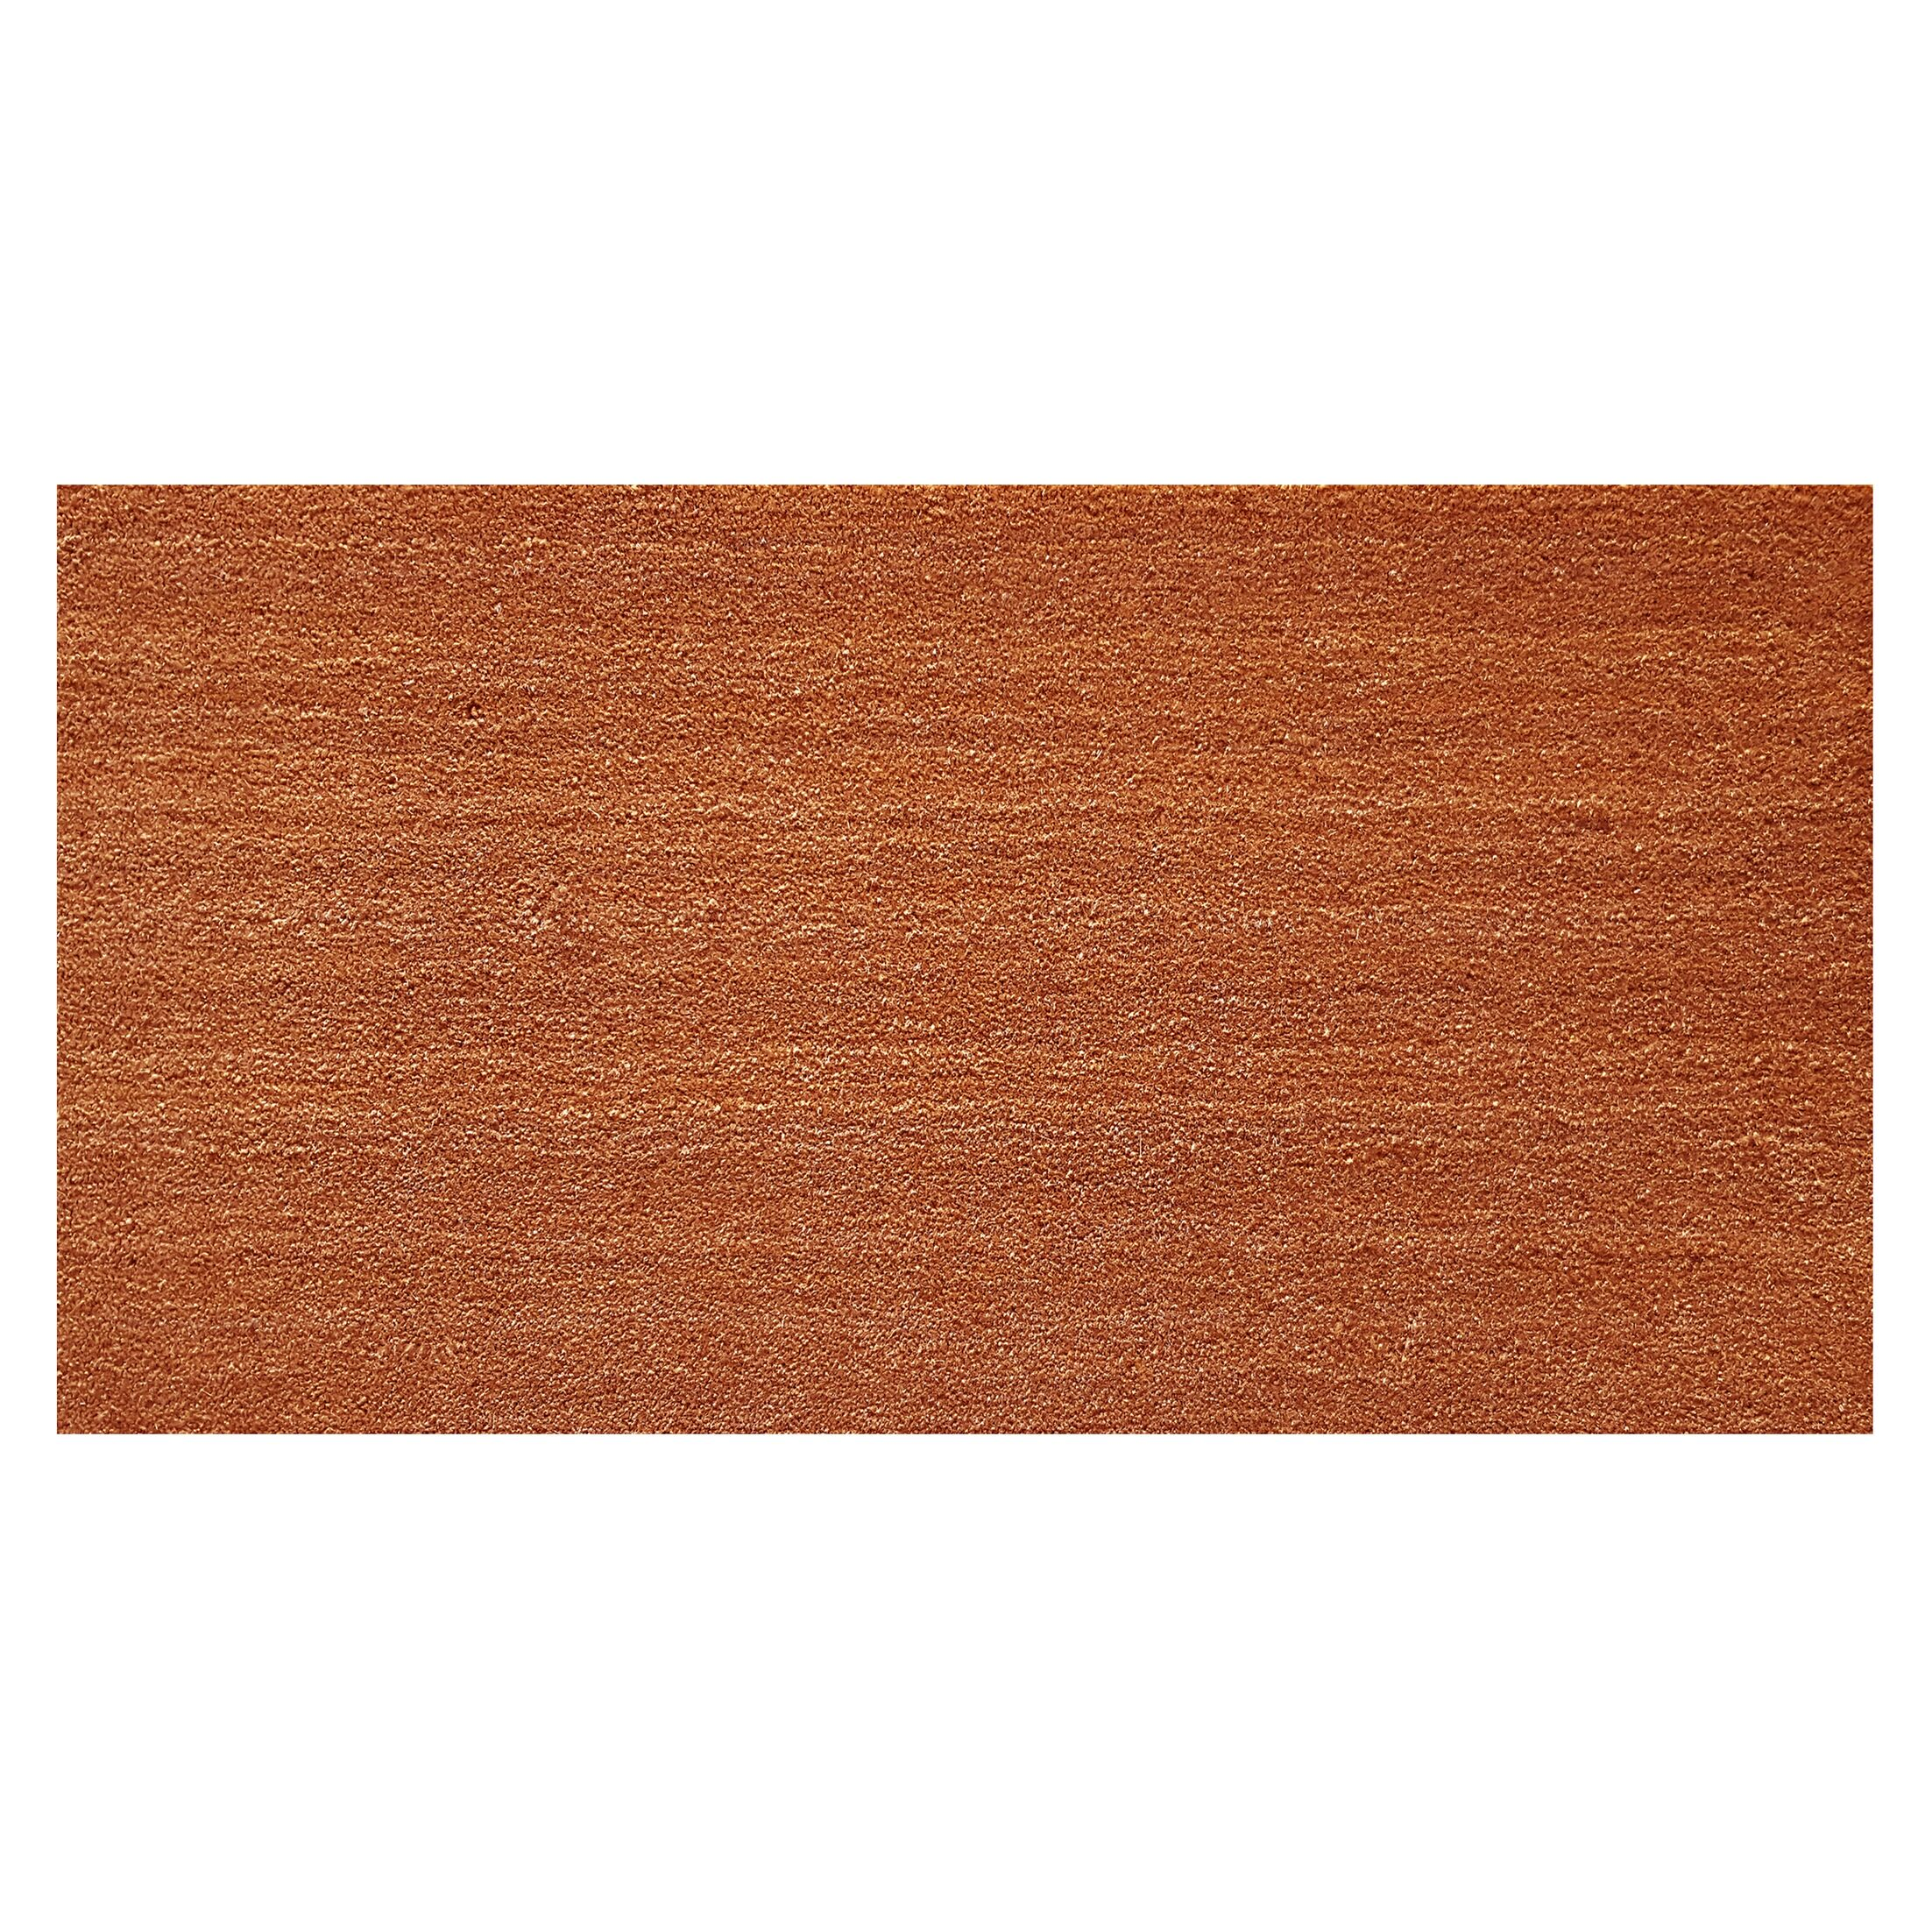 Solid Doormat Mat Size: Rectangle 1'6